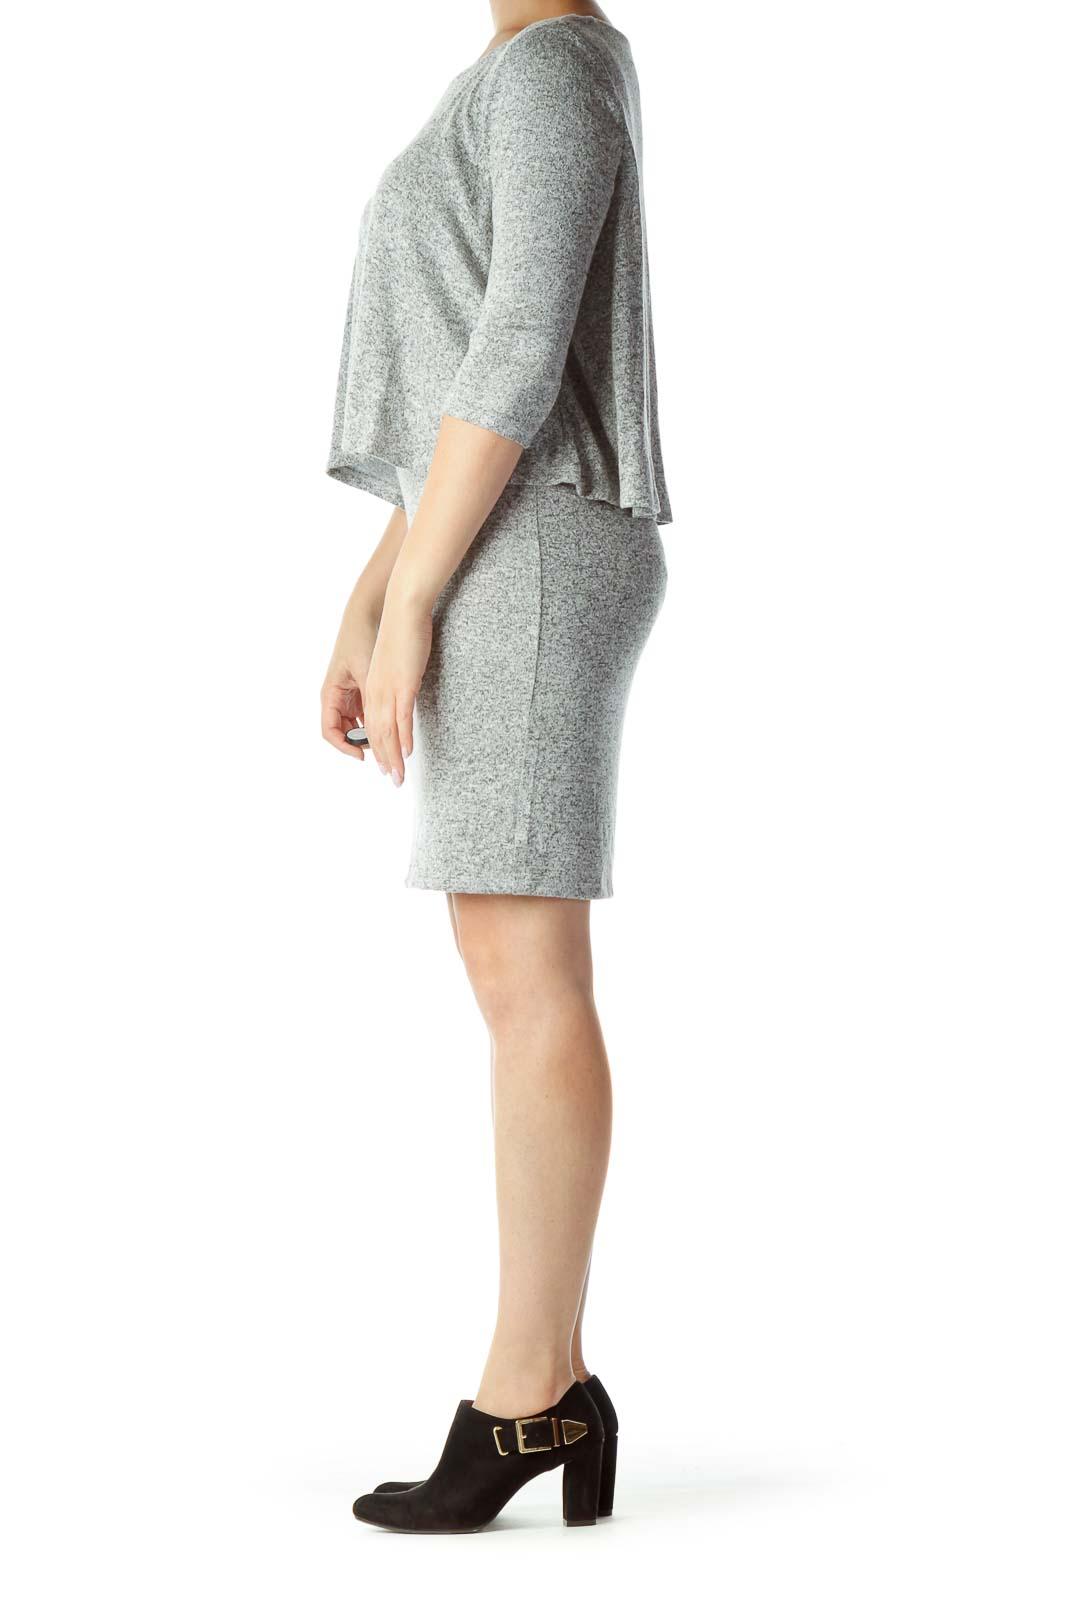 Heather Gray 3/4-Sleeve Knit Dress